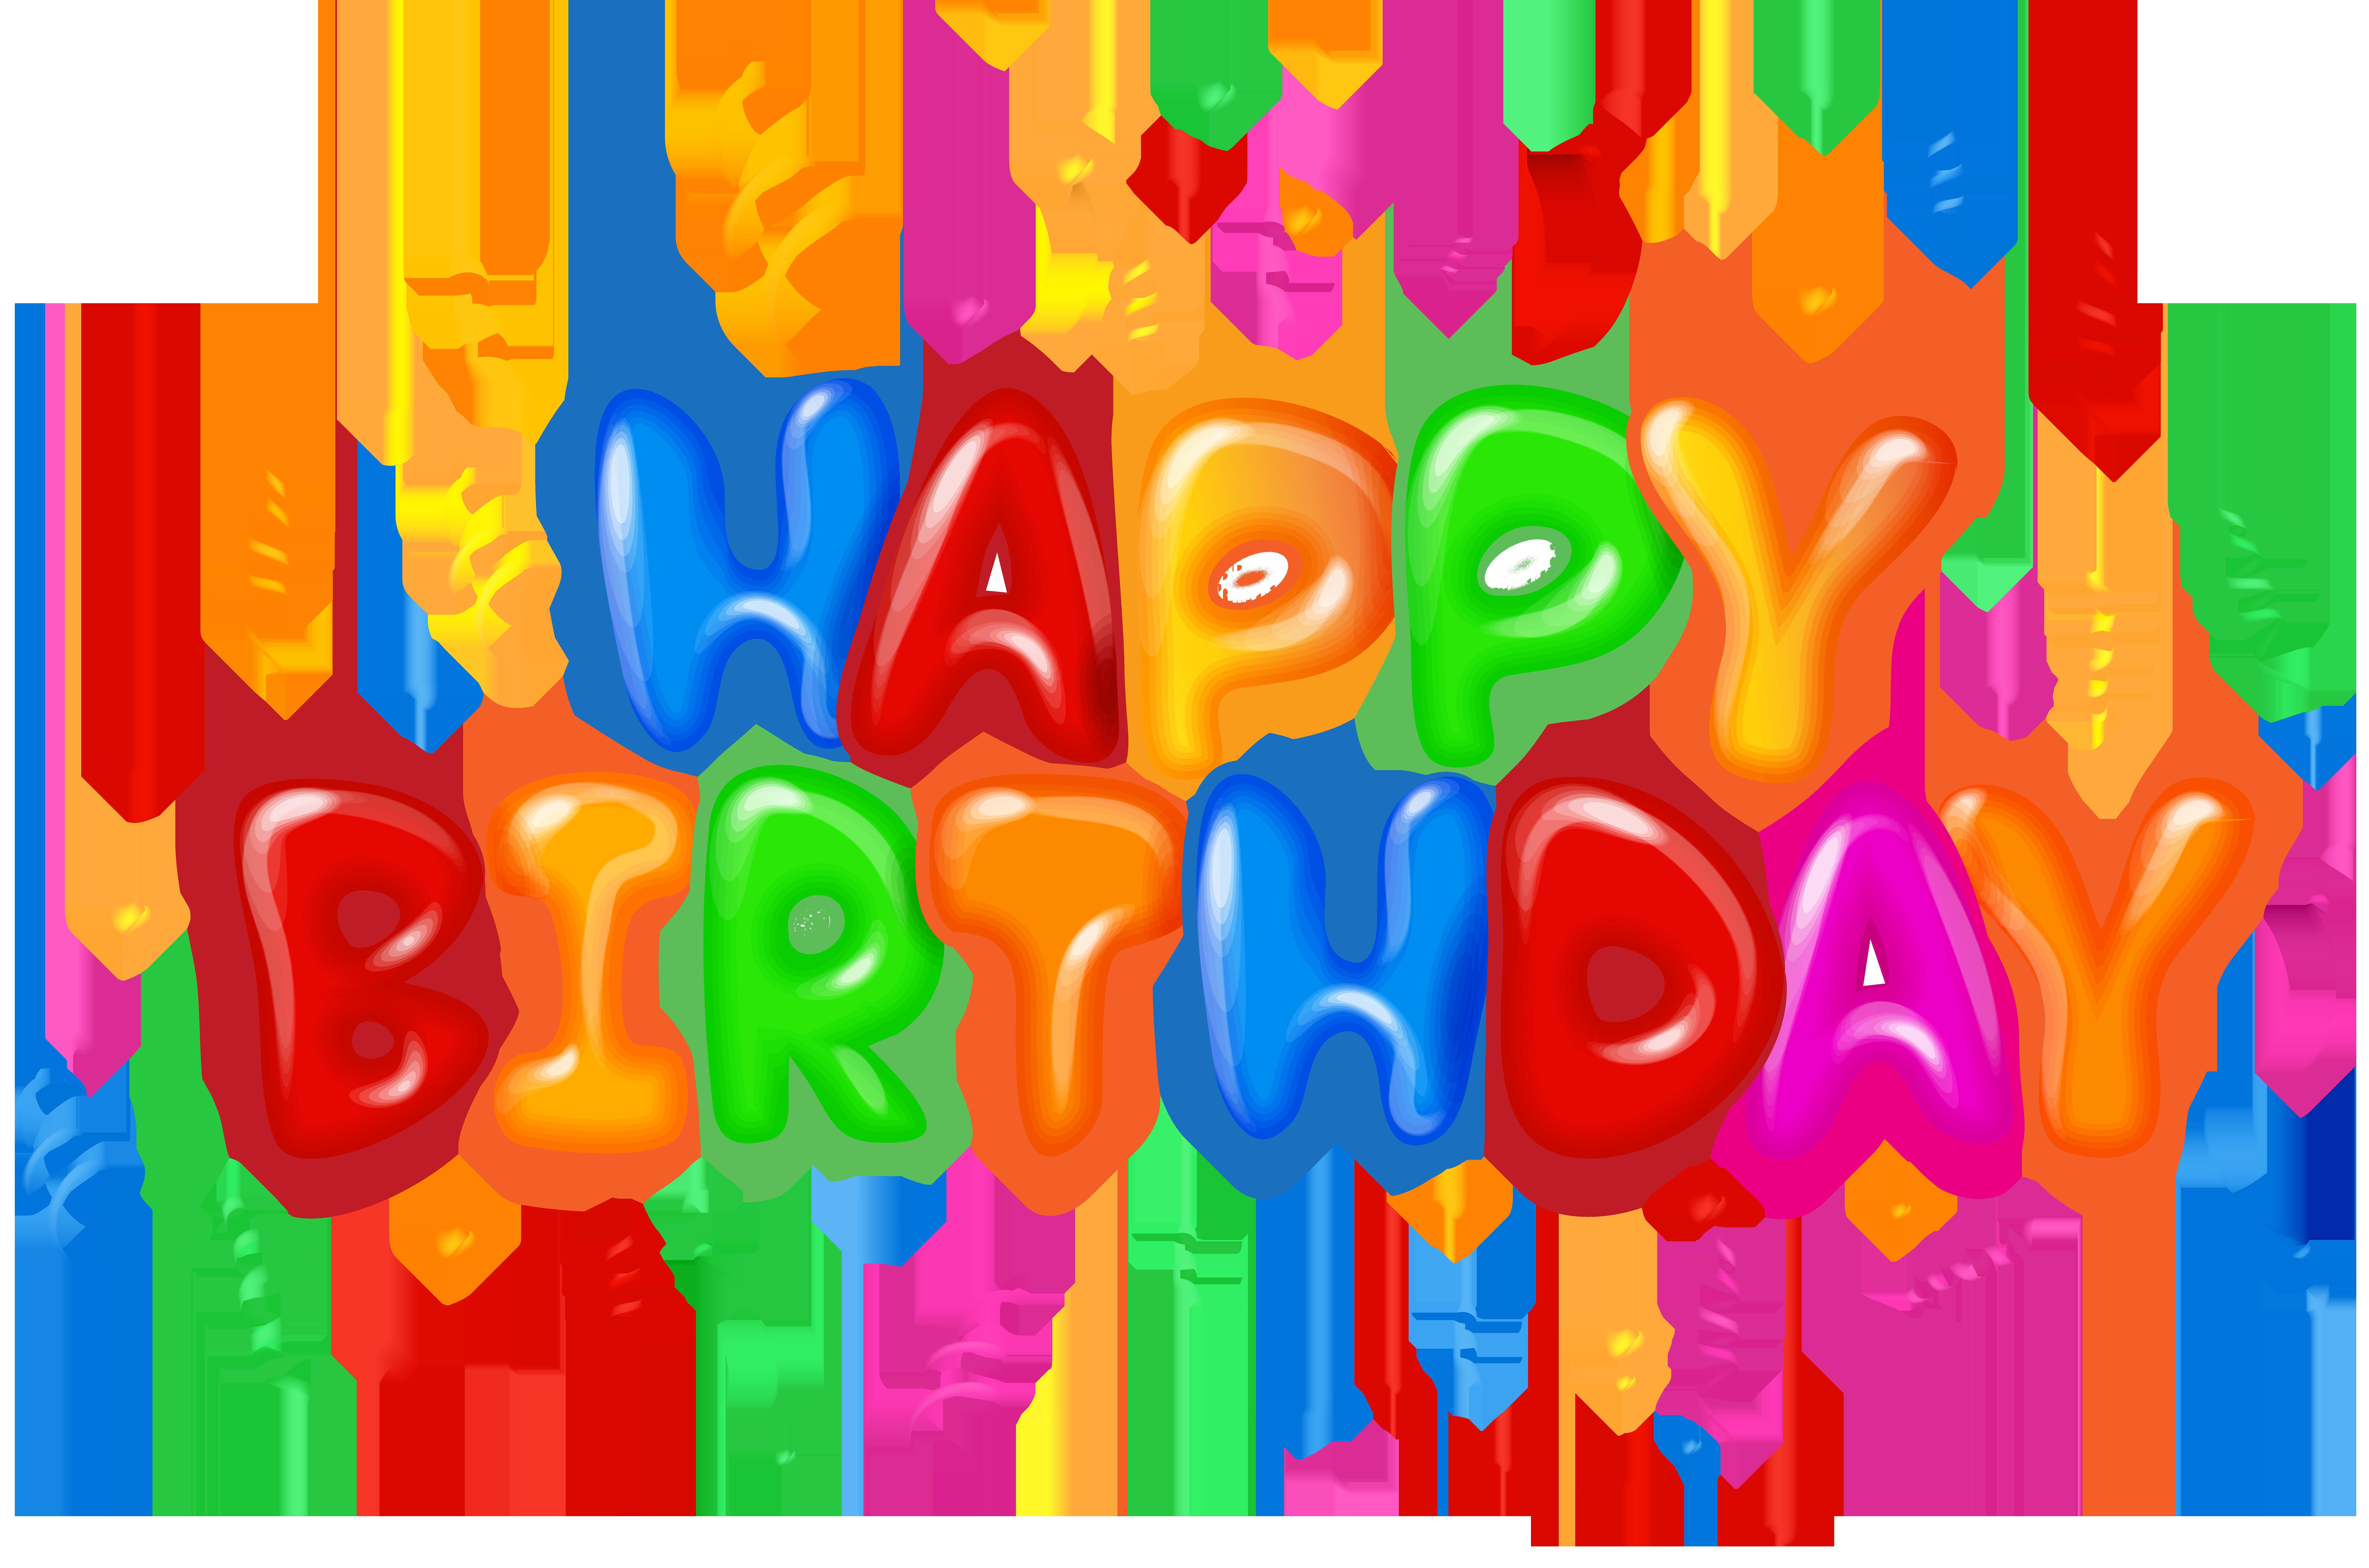 B clipart text. Happy birthday decor png